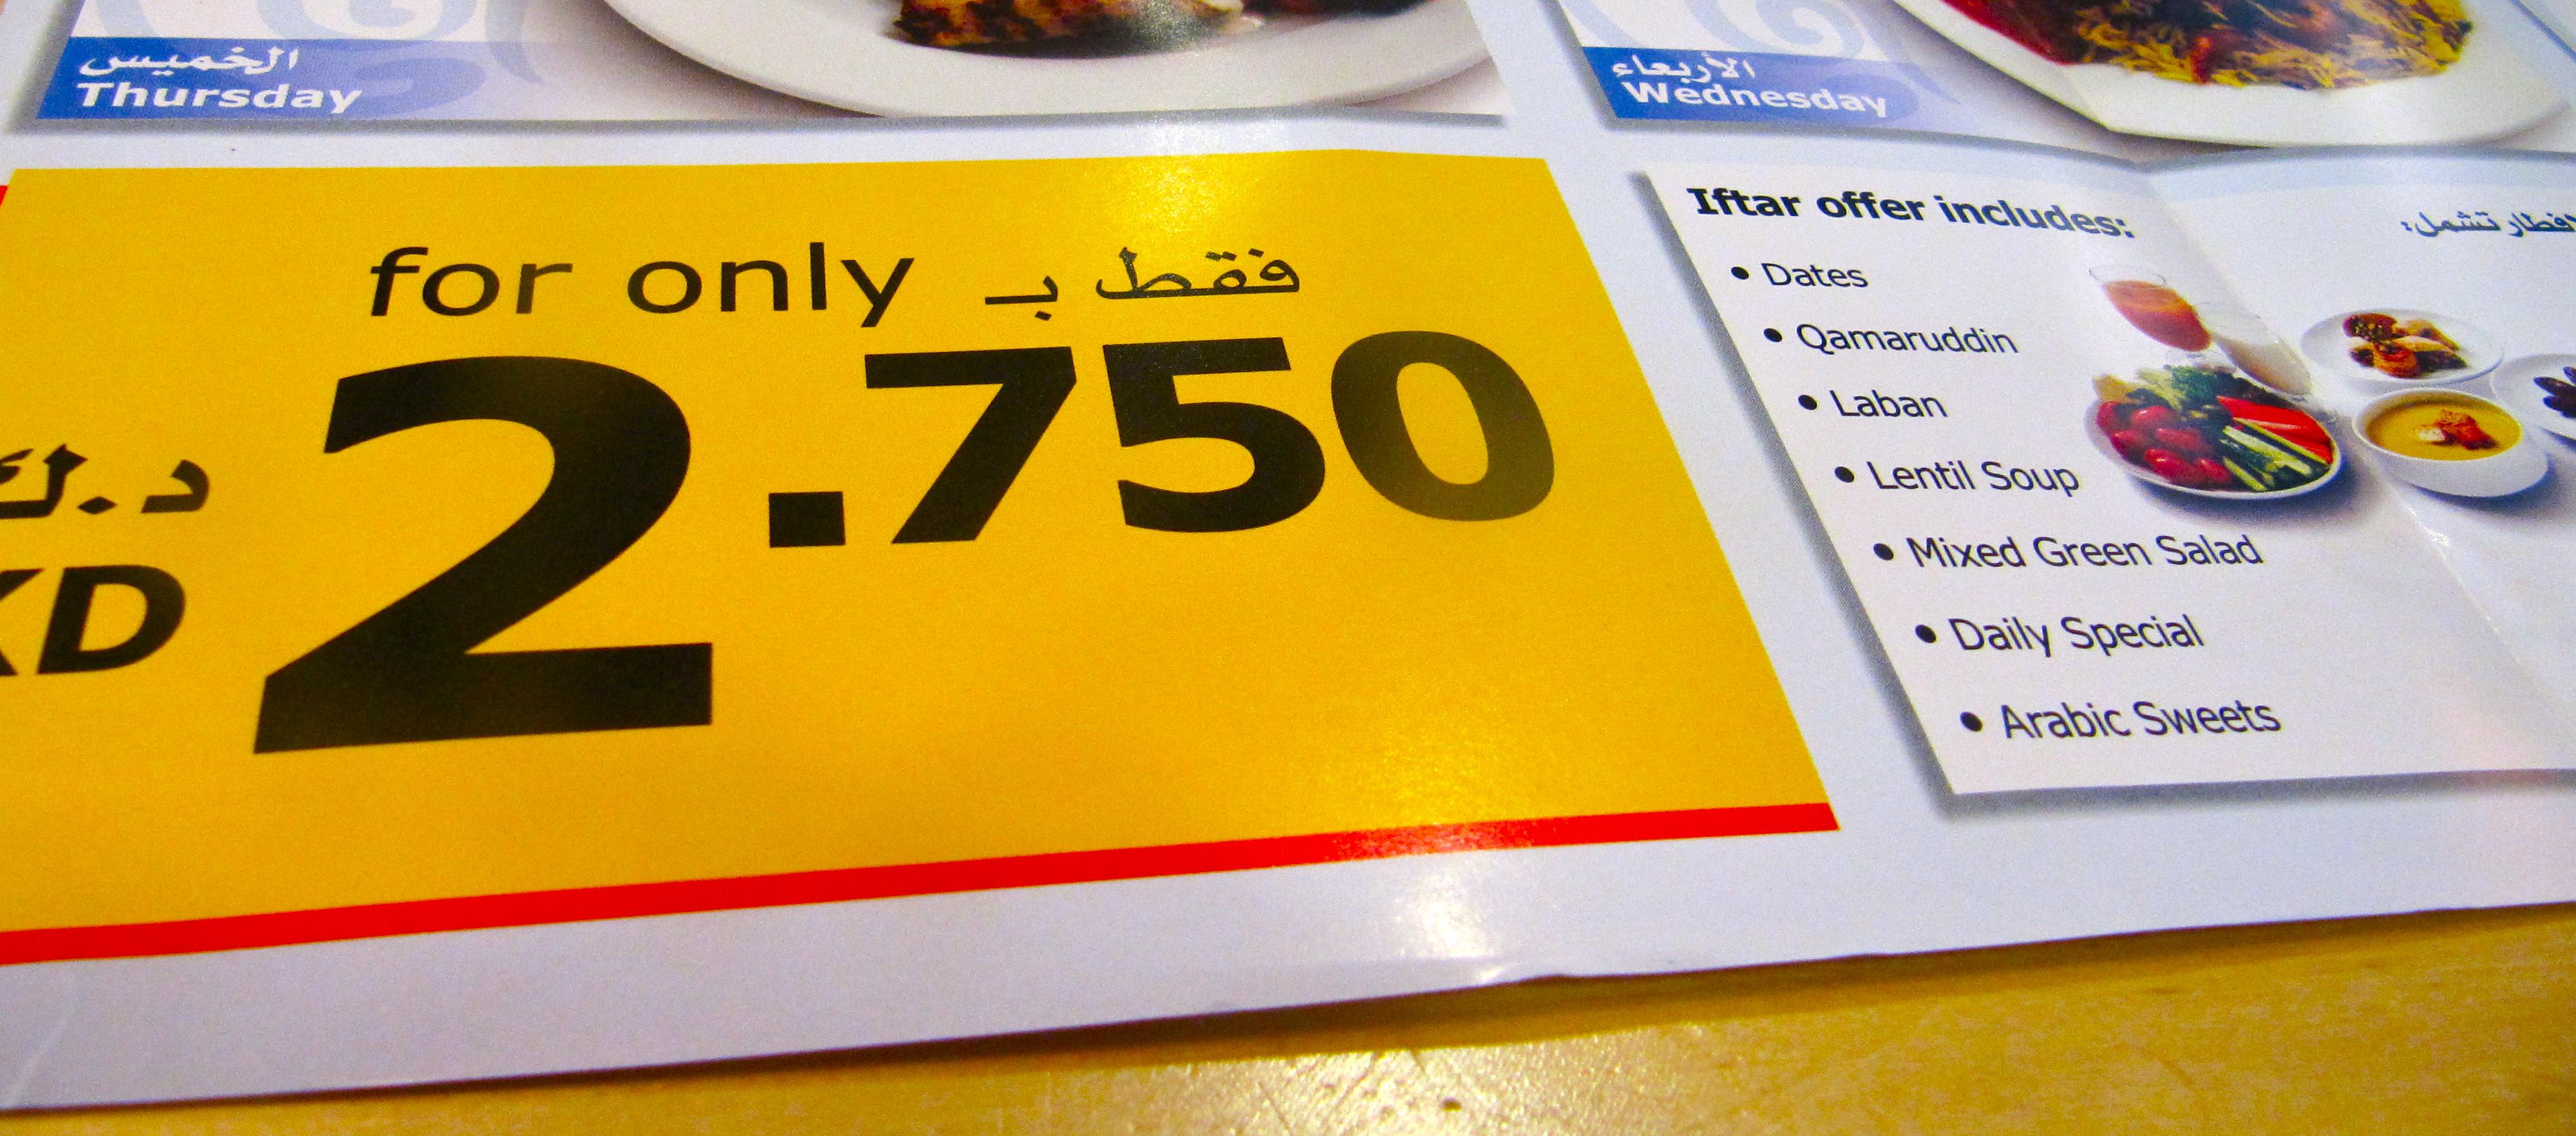 Delightful The Price Is Right. Ramadan, Fe6oor, IKEA.